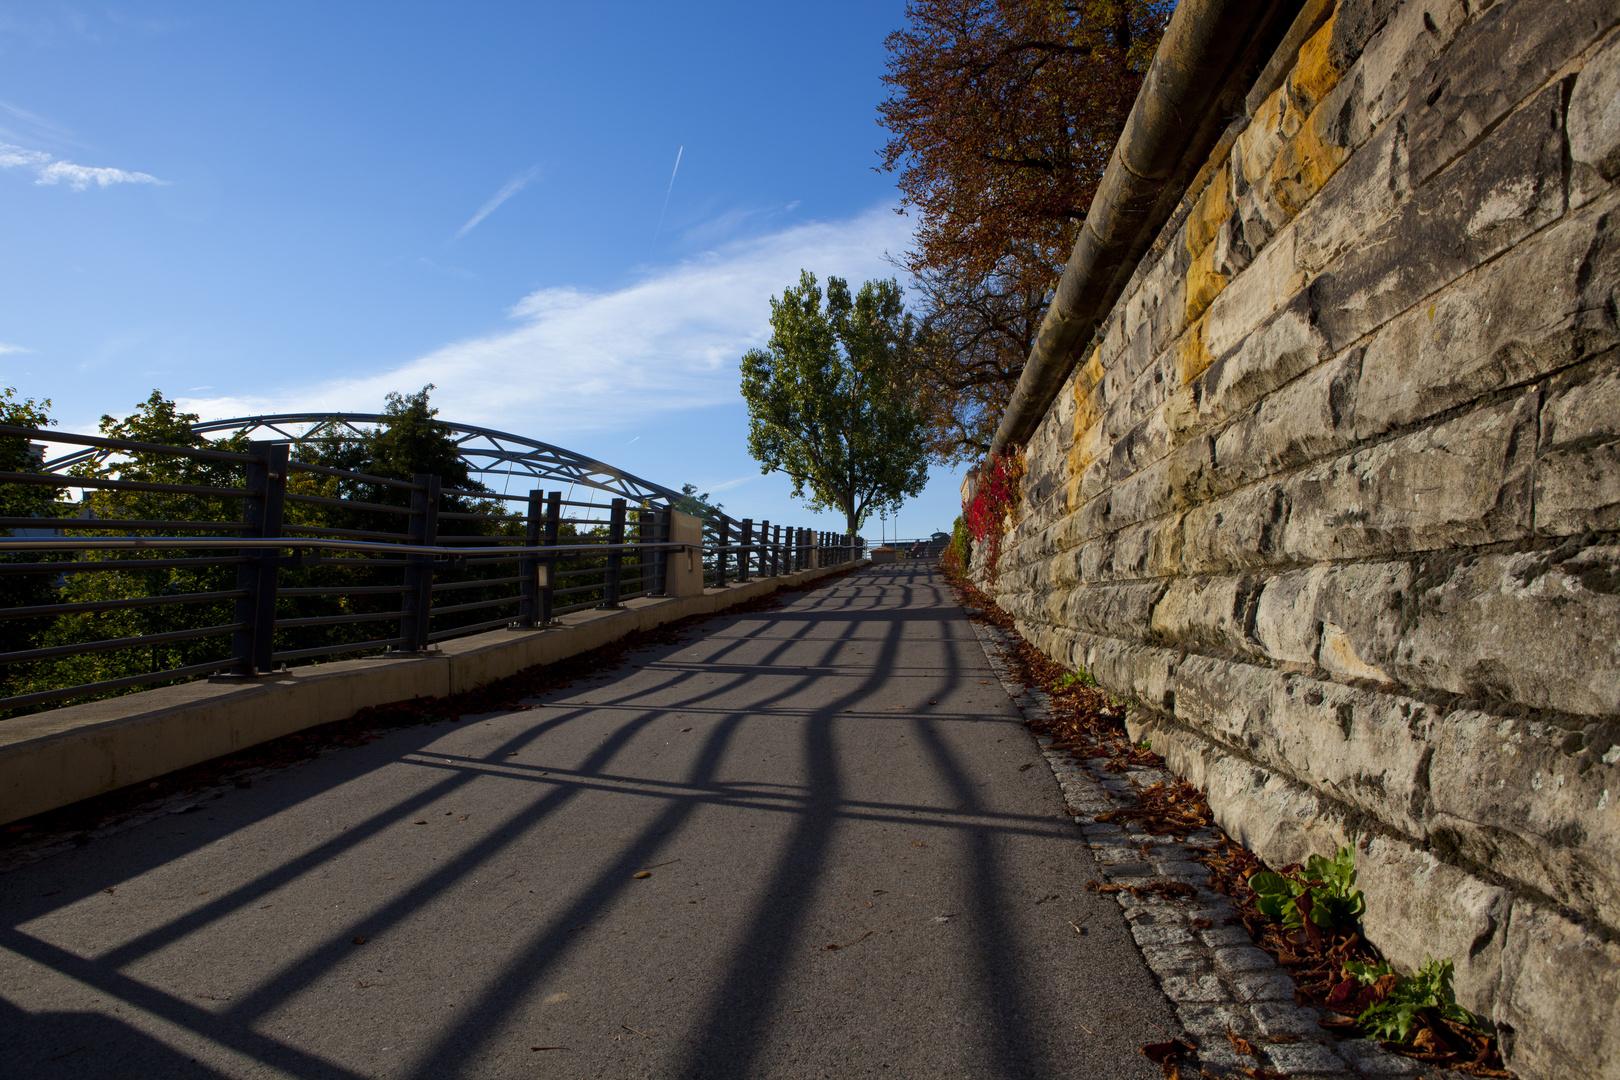 Fußweg zur Luitpoldbrücke im Herbst